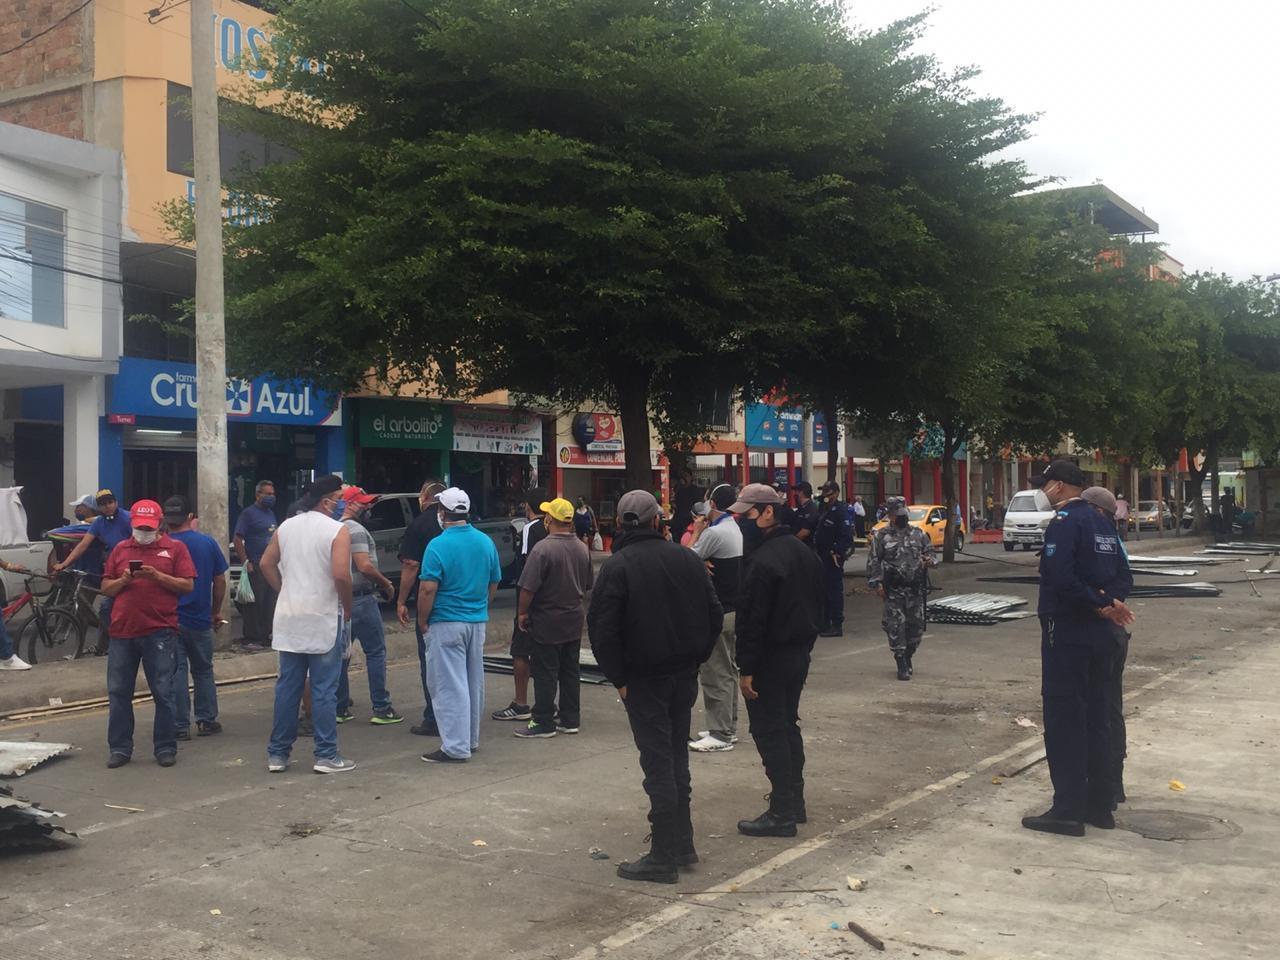 Comerciantes de cárnicos buscan volver a la calle Alajuela, Municipio se niega